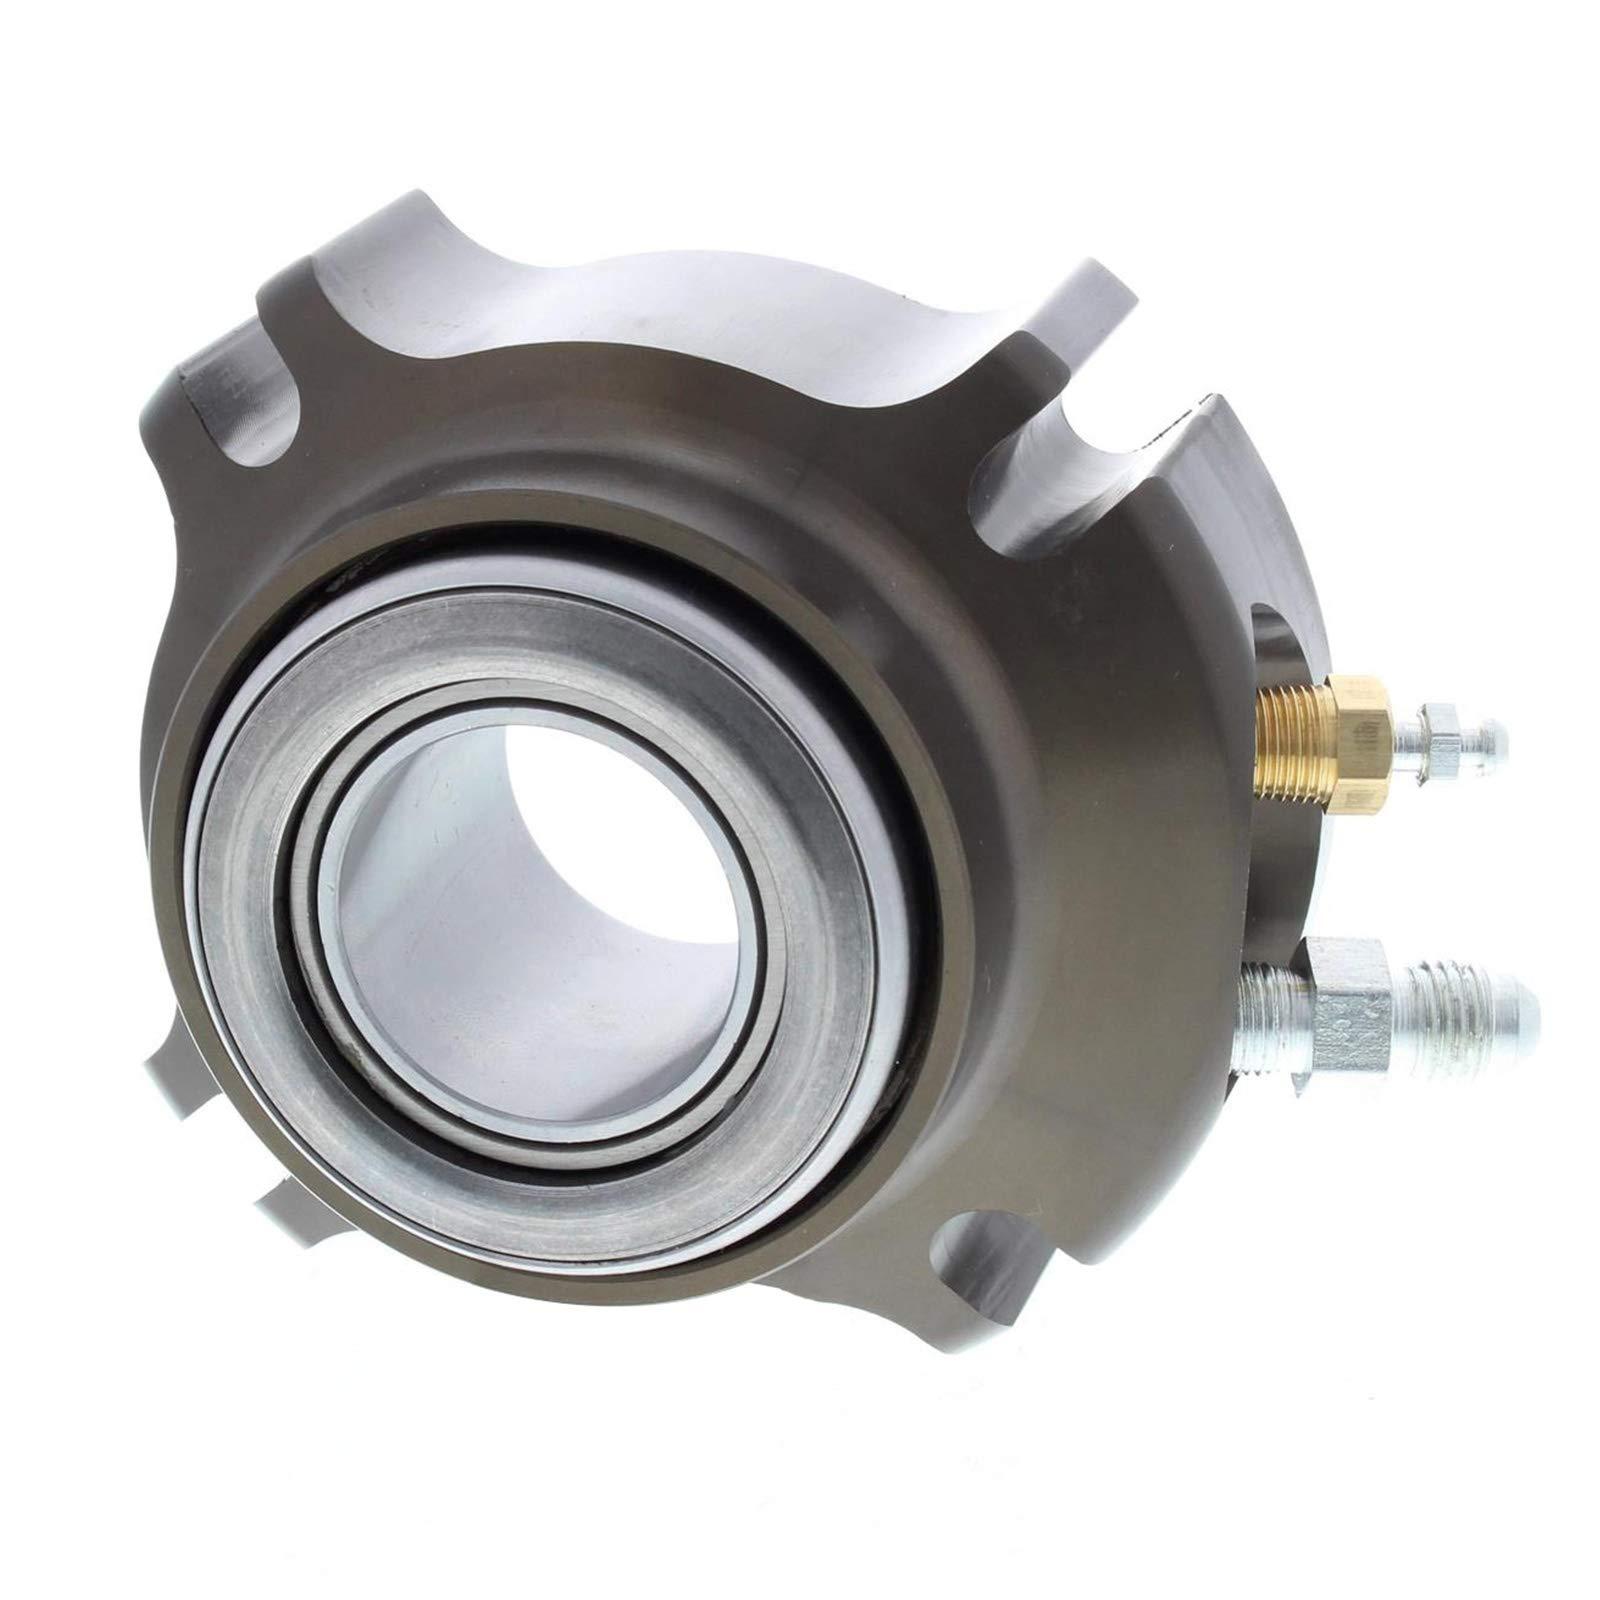 Racing Clutch Hydraulic Throwout Release Bearing